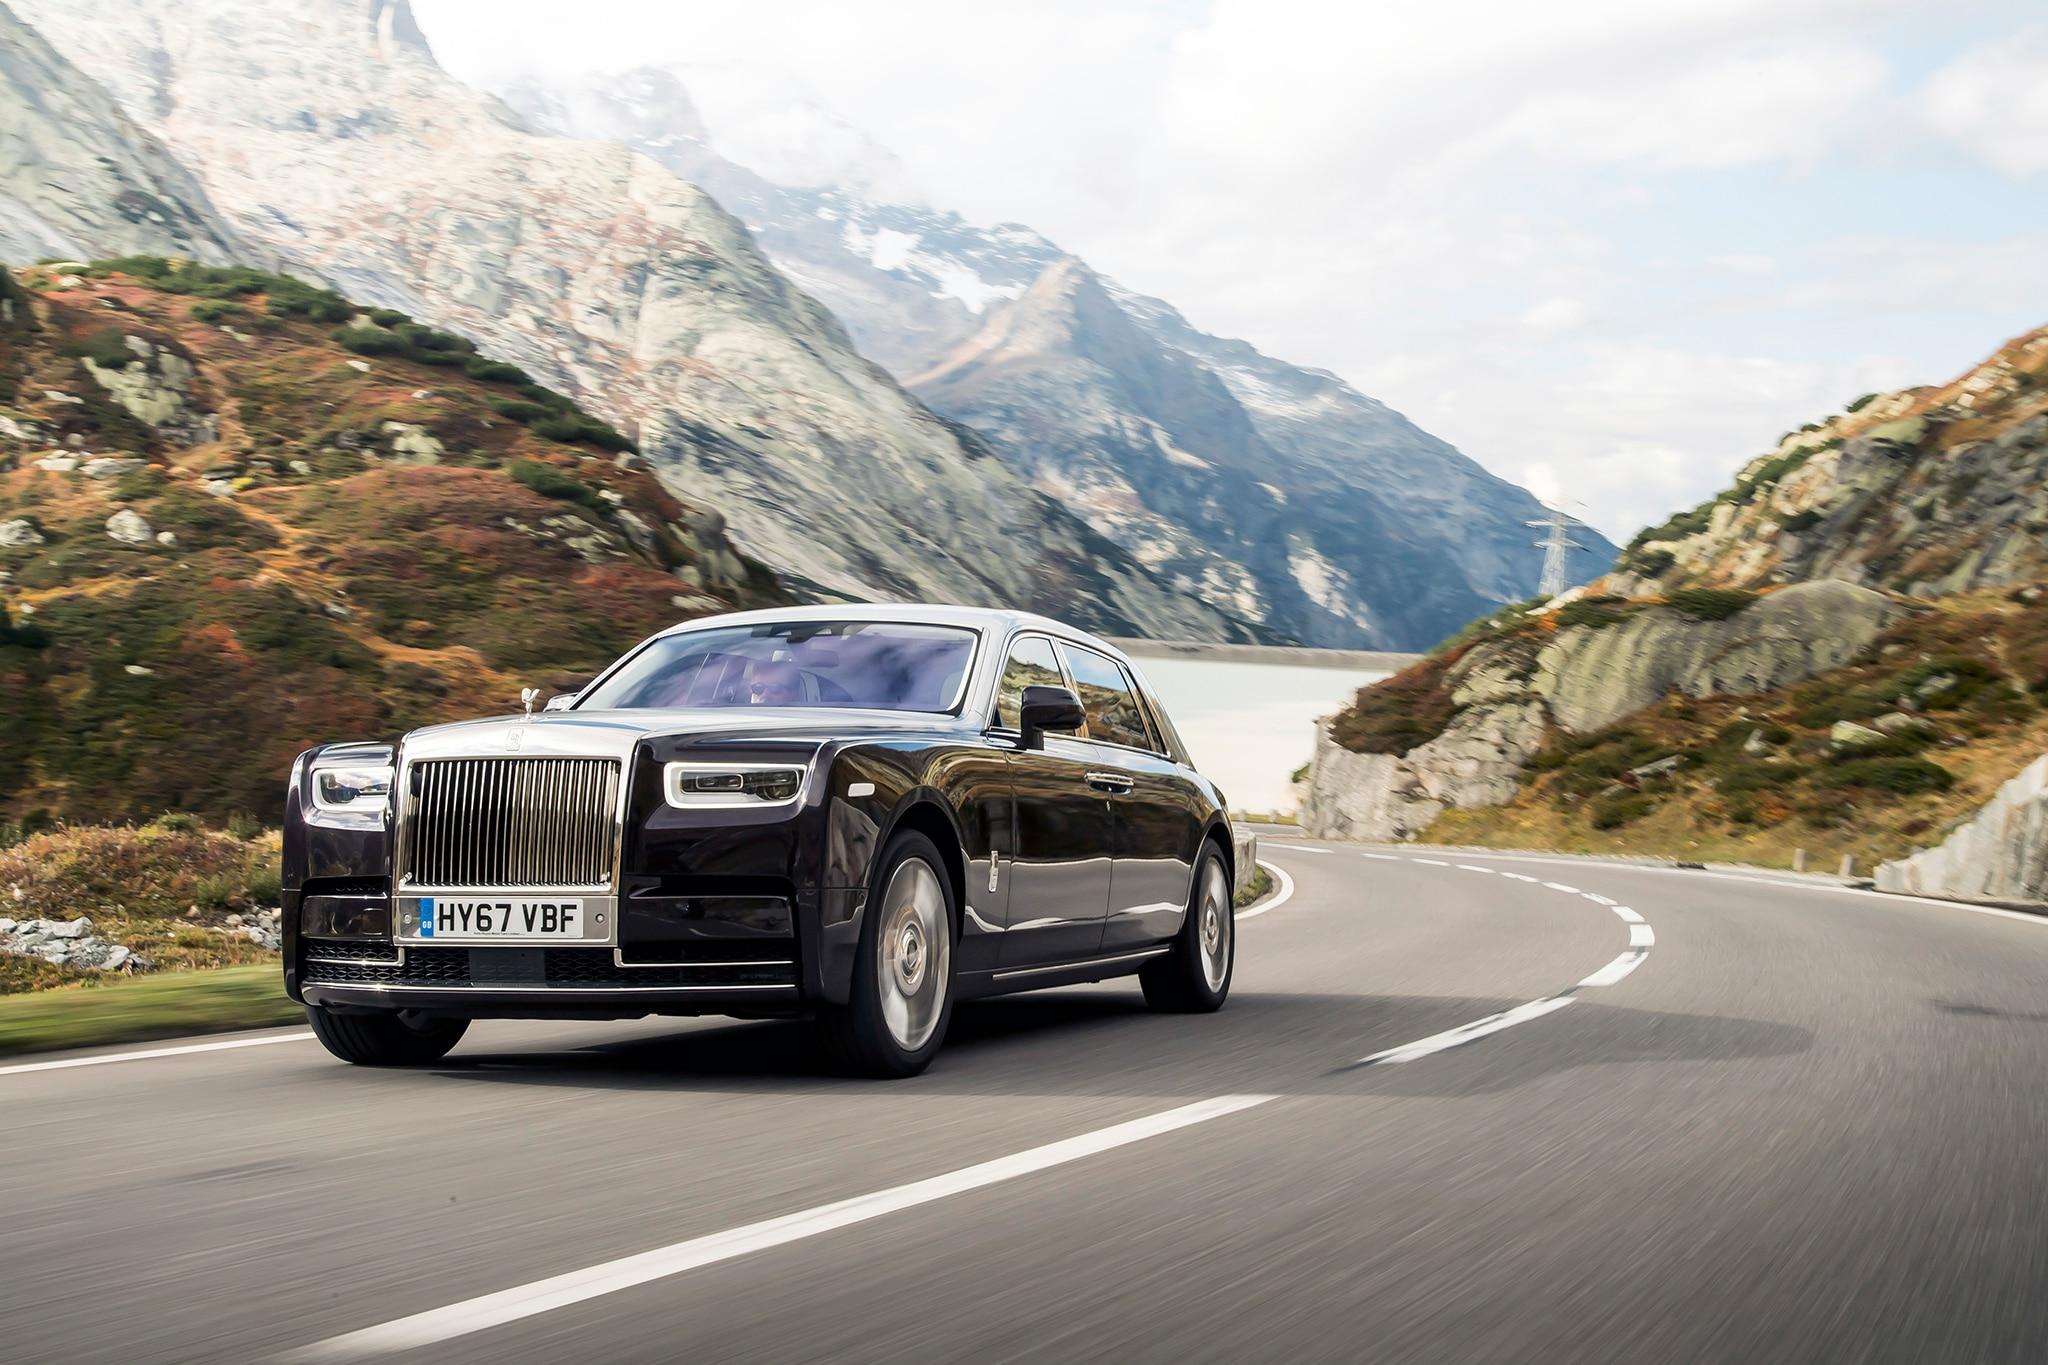 2018 Rolls Royce Phantom VIII Extended Wheelbase Front Three Quarter In Motion 05